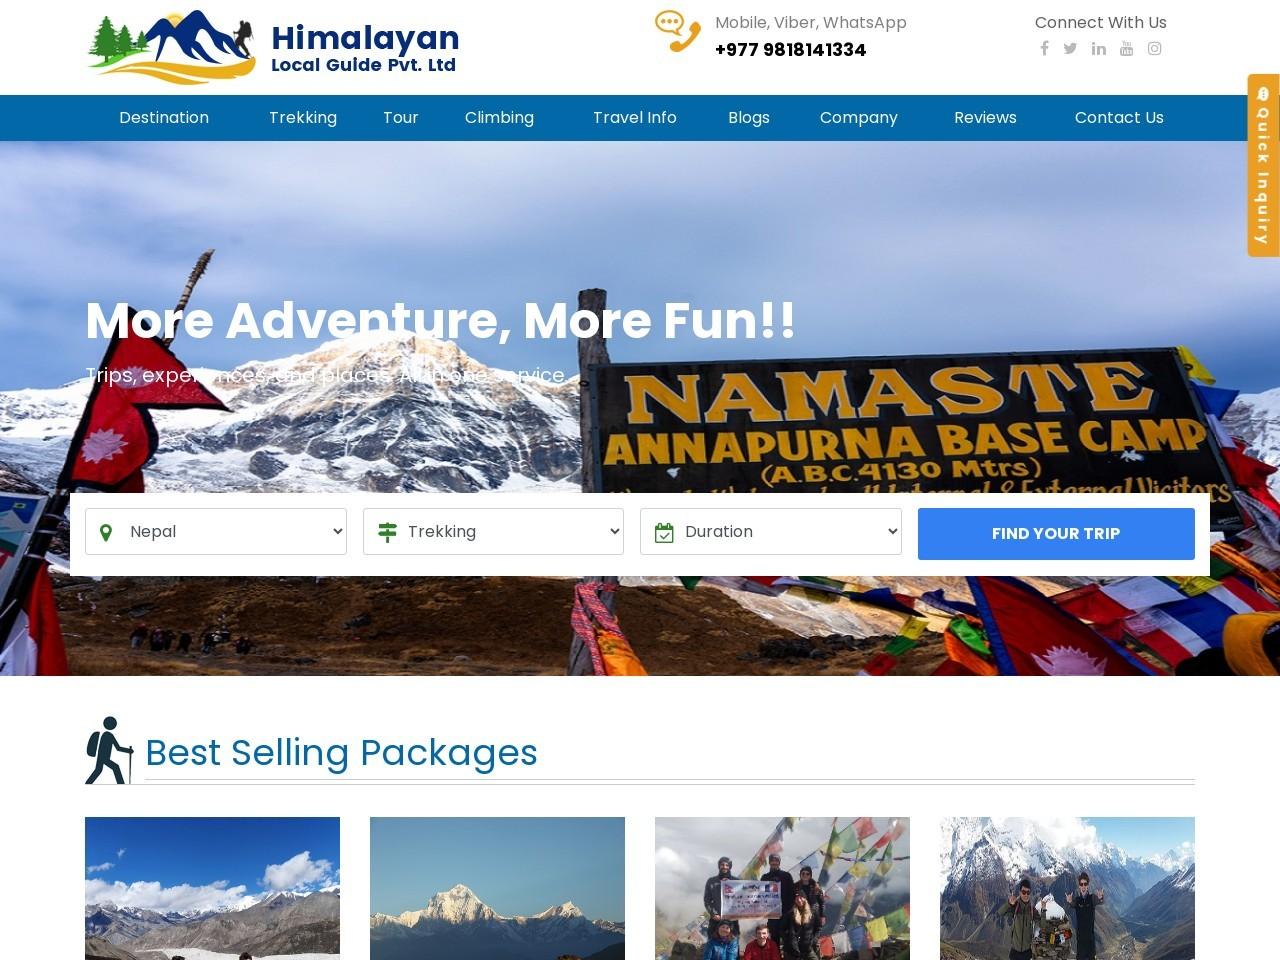 Langtang valley Trek – 10 Days